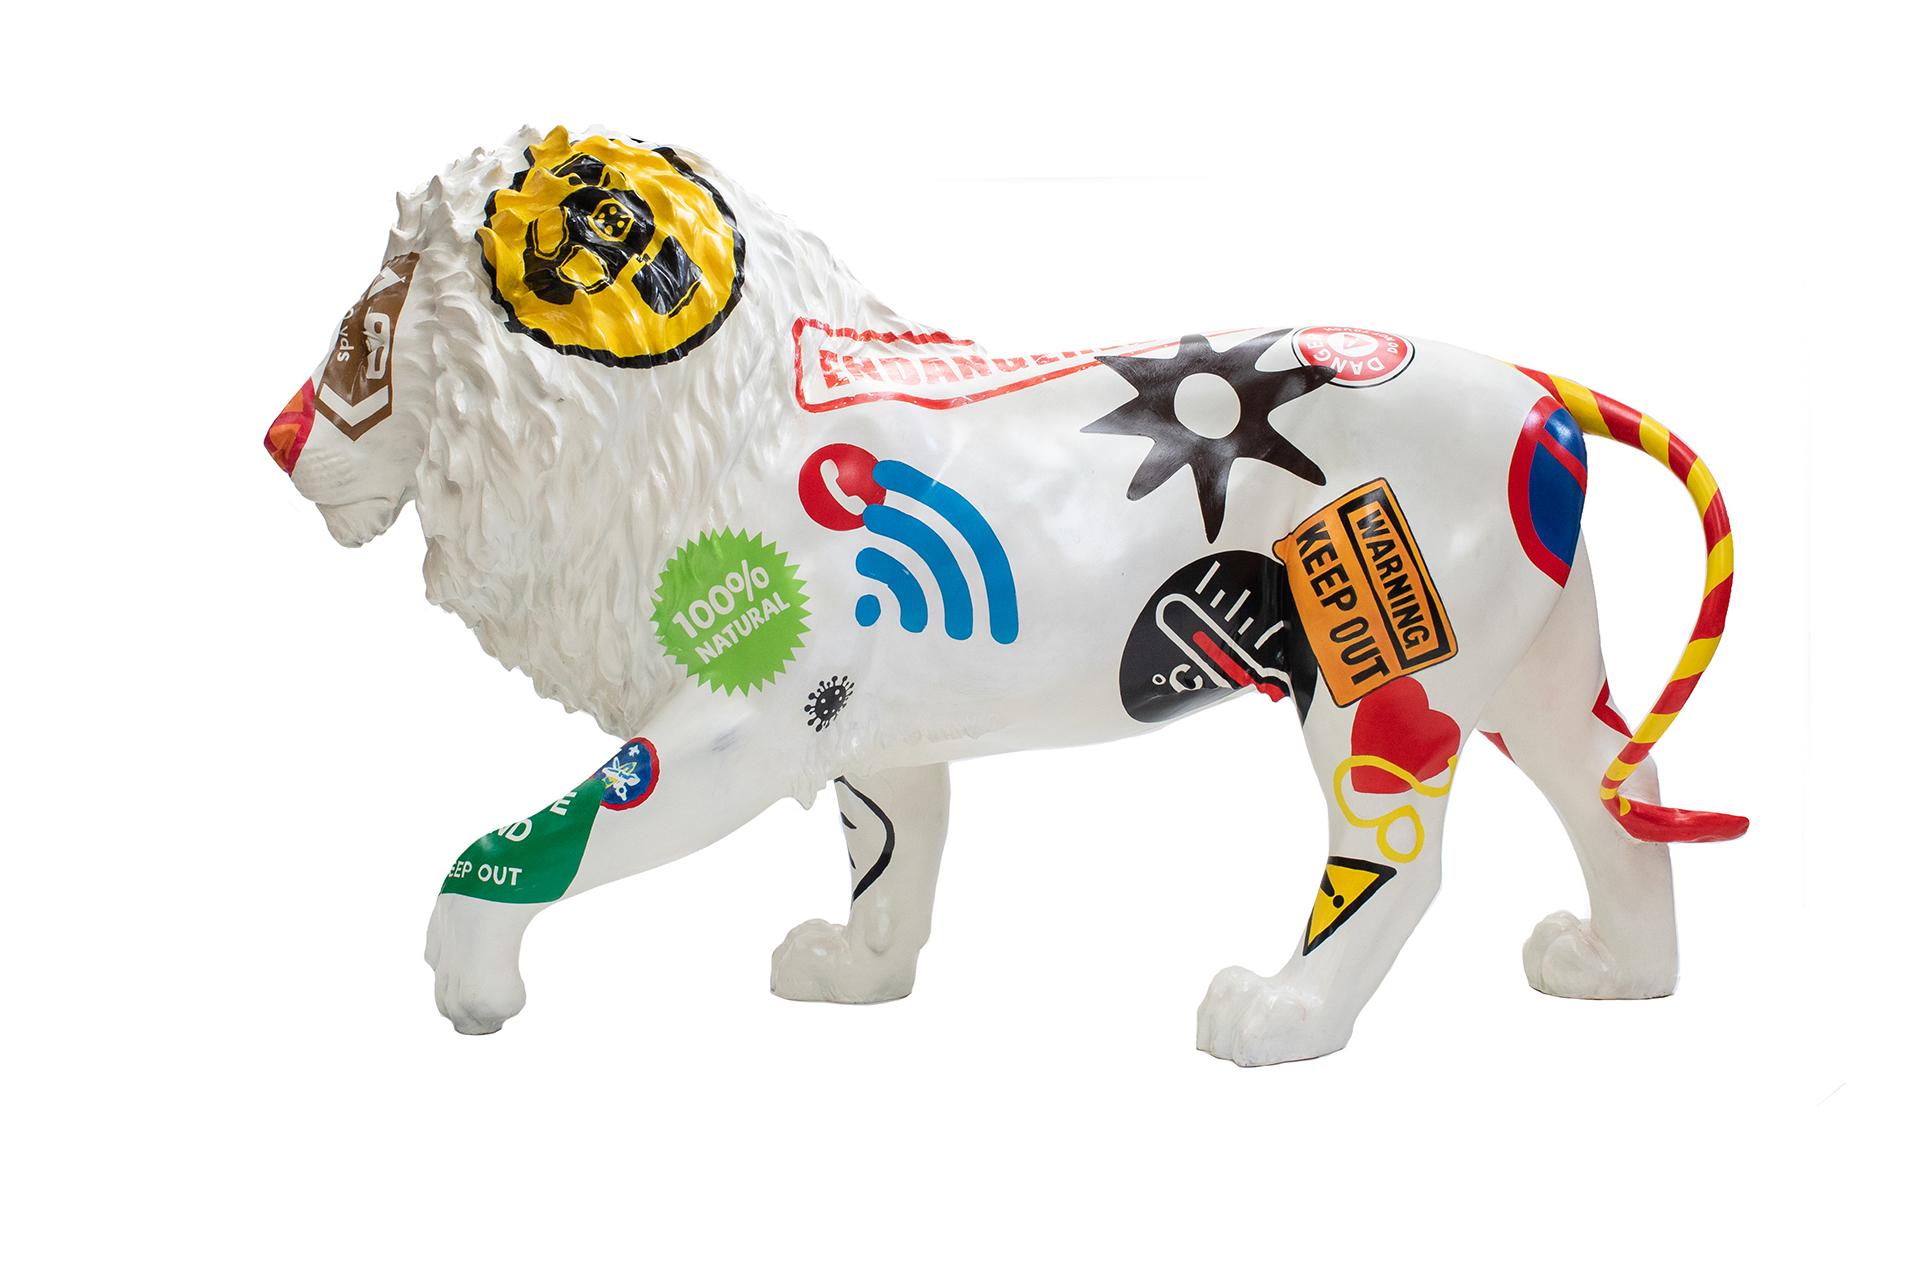 Tusk Lion Trail 2021 - David Mach - Generously sponsored by Emso Asset Management Image Credit: Nick Andrews